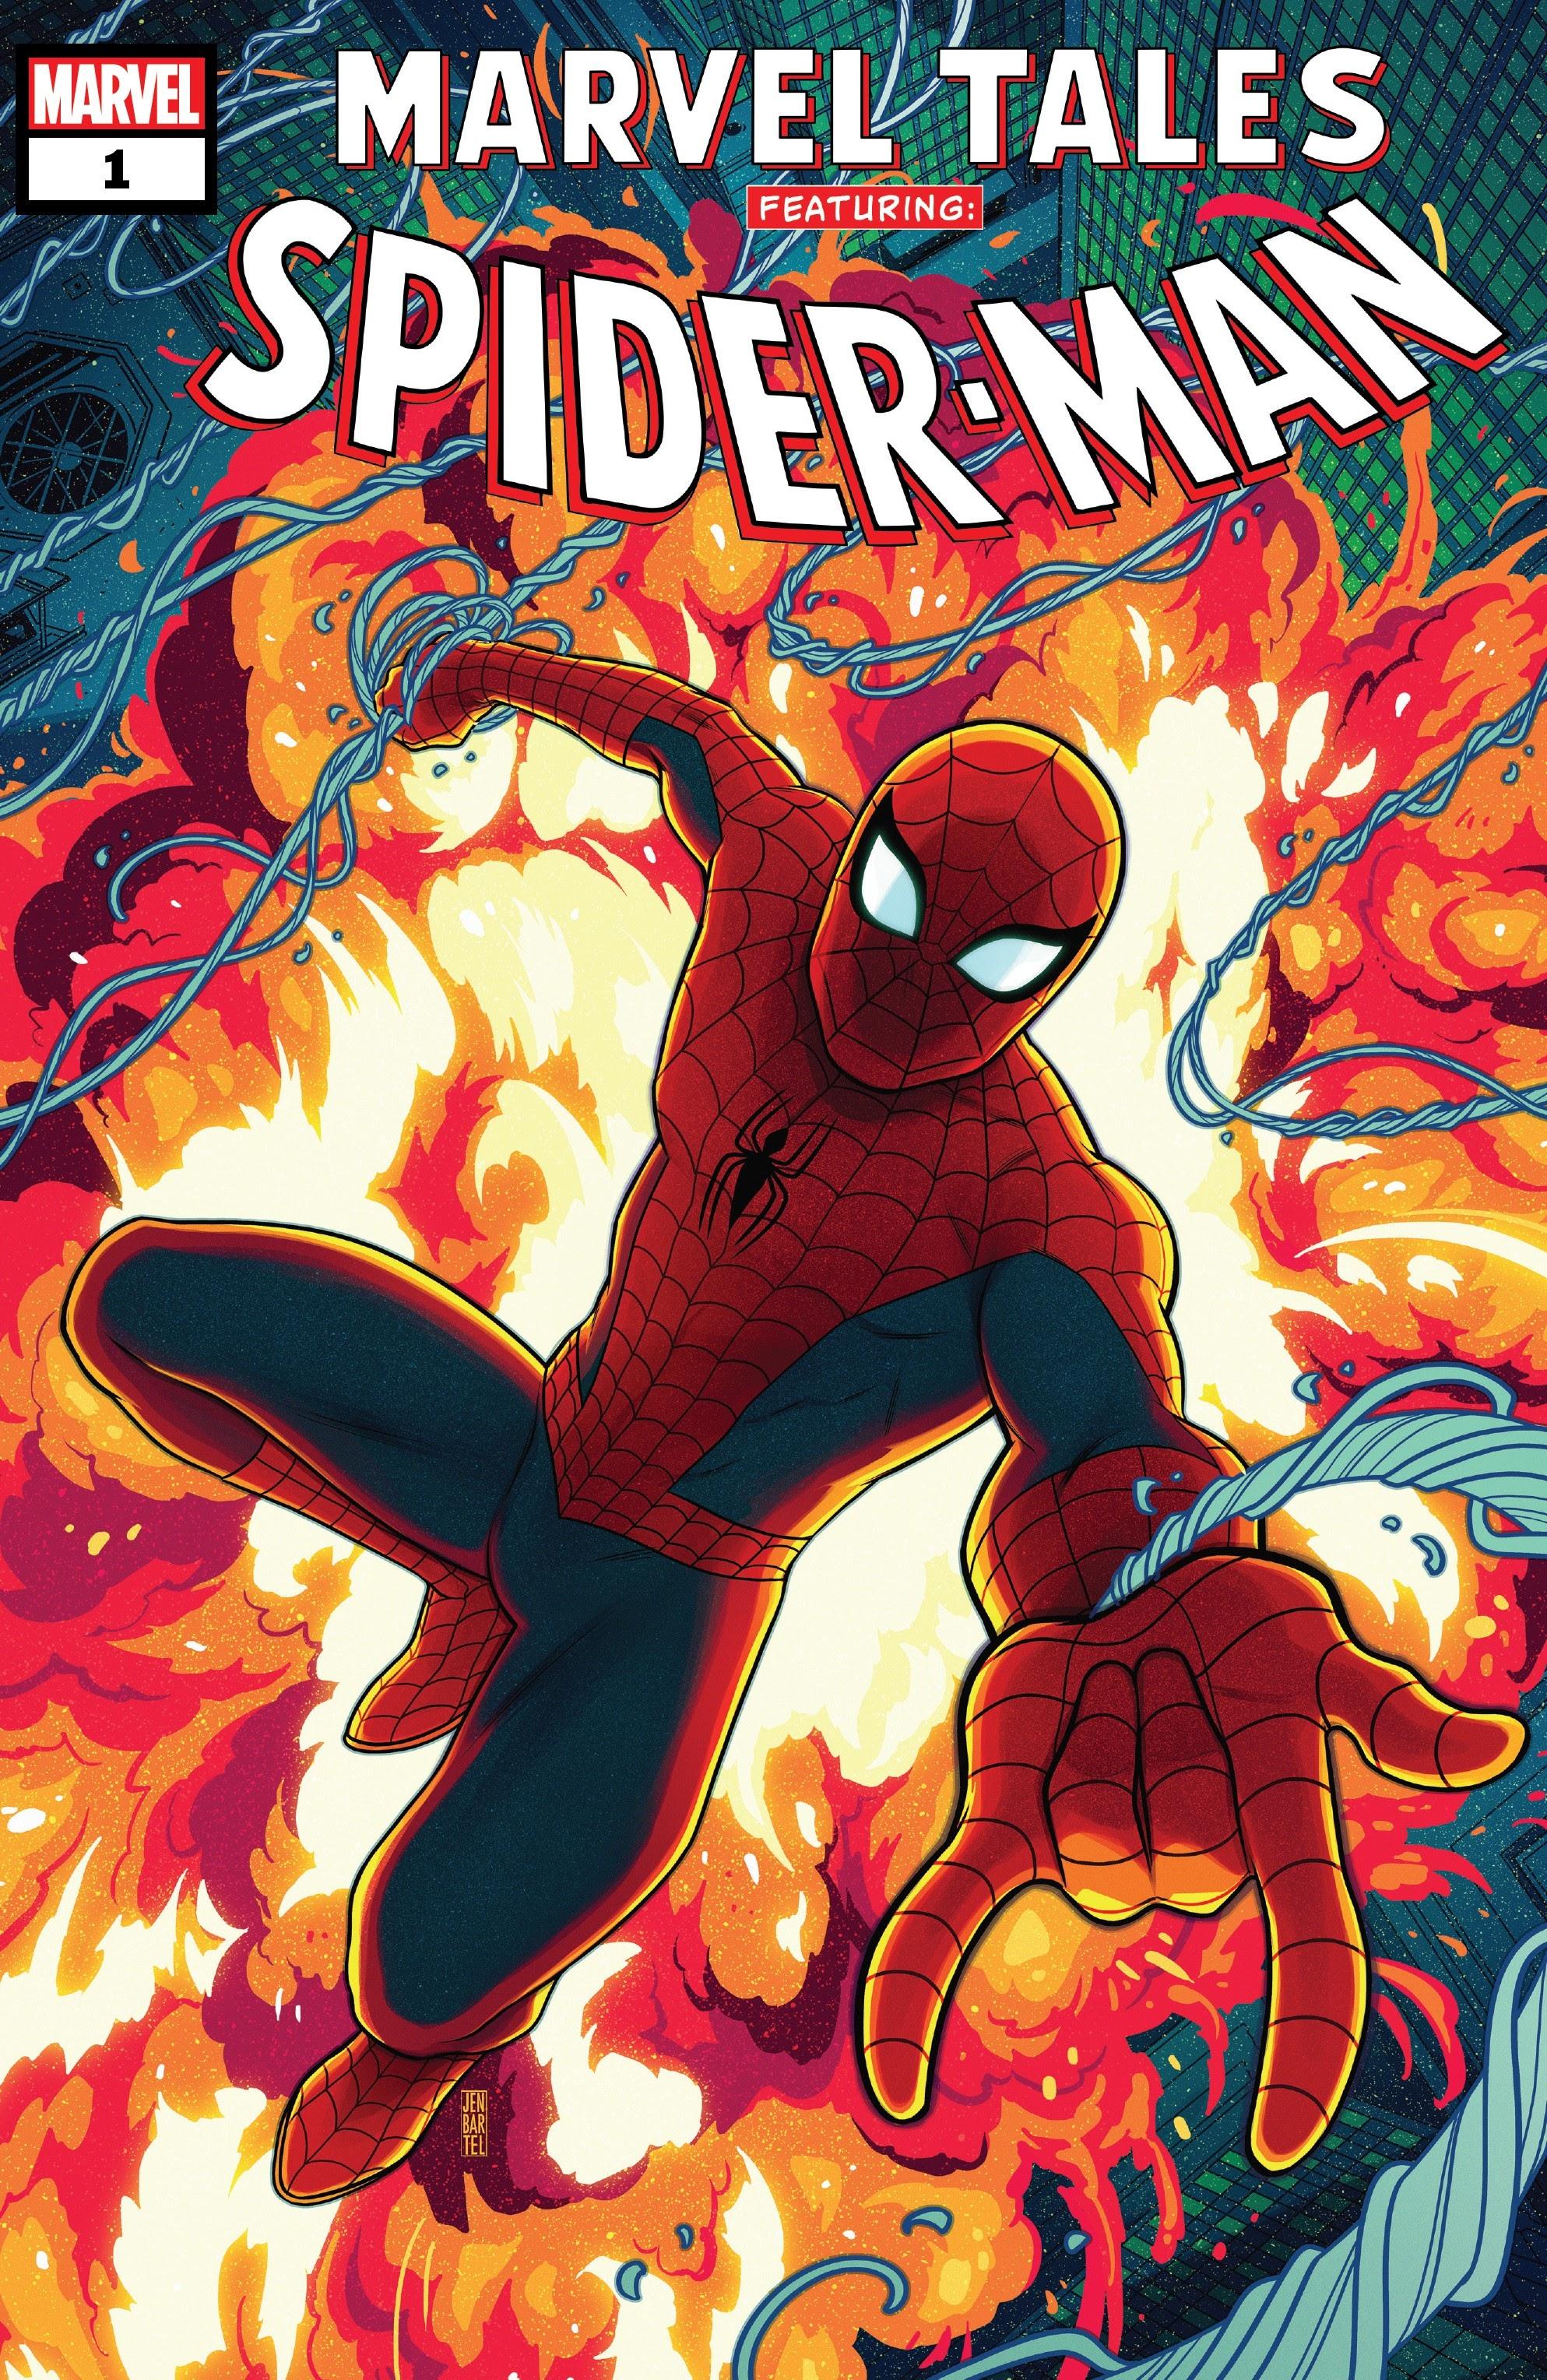 Marvel Tales: Spider-Man Full Page 1